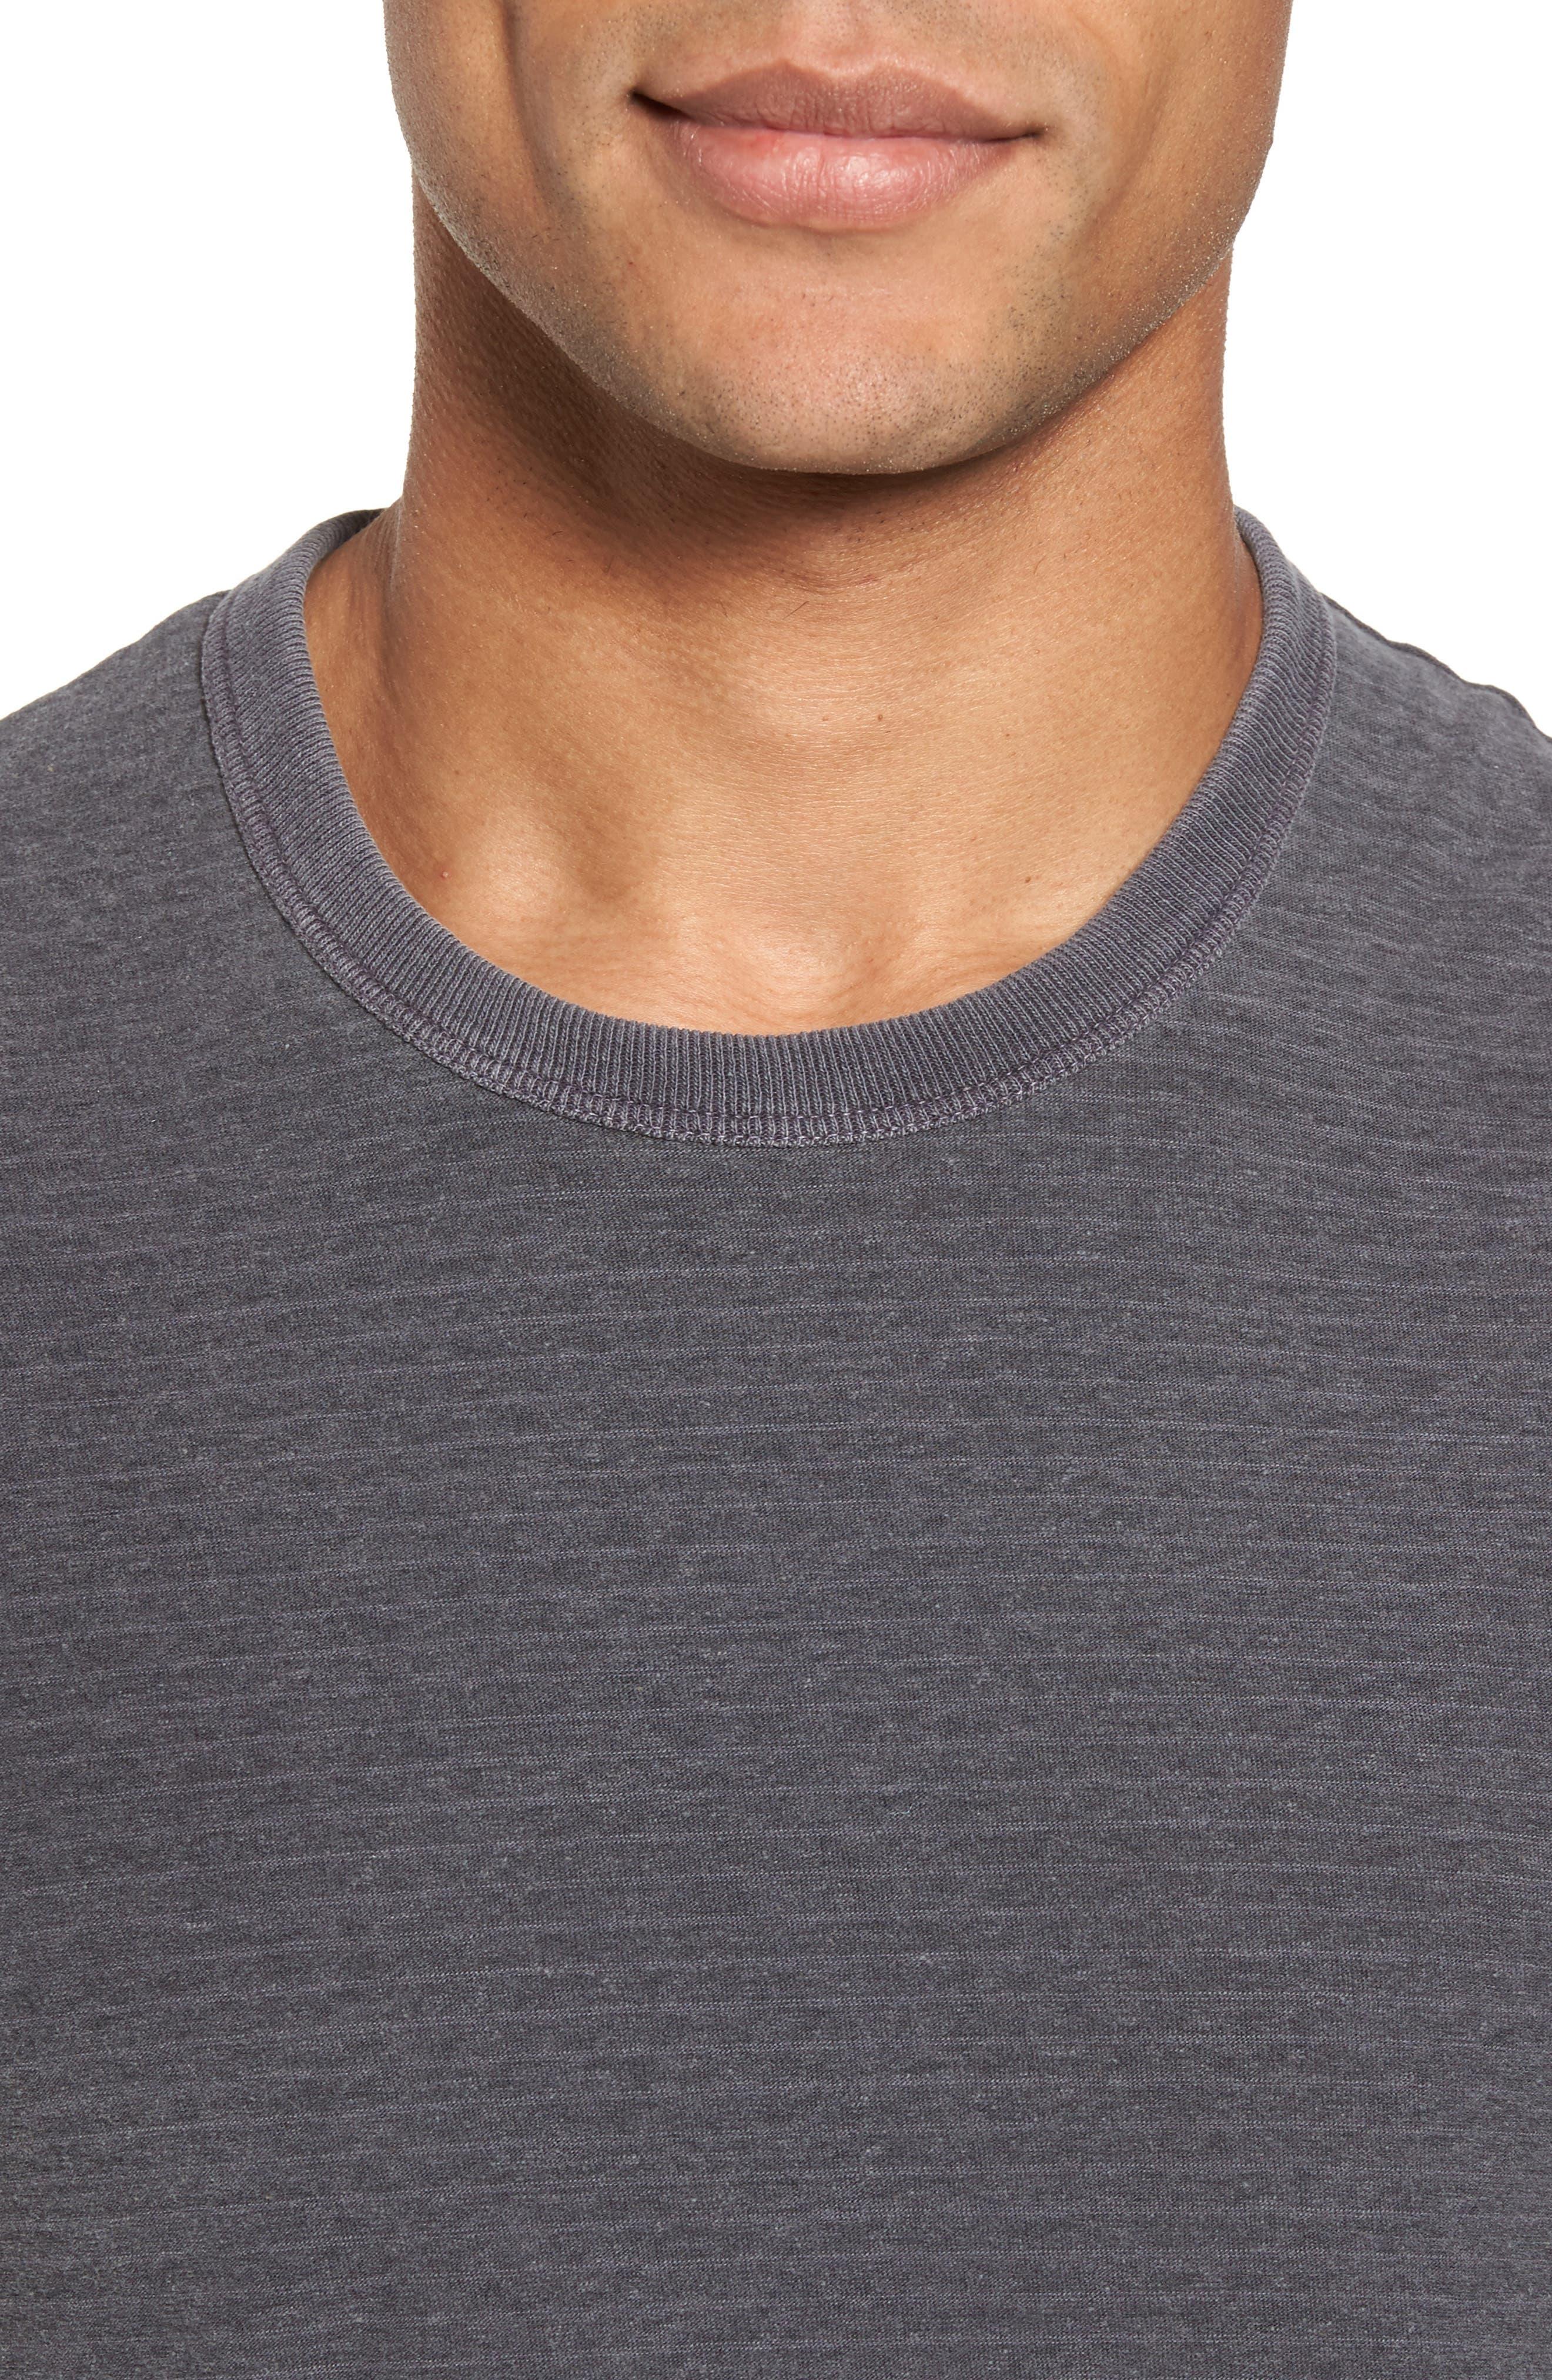 Microstripe Ringer T-Shirt,                             Alternate thumbnail 4, color,                             020